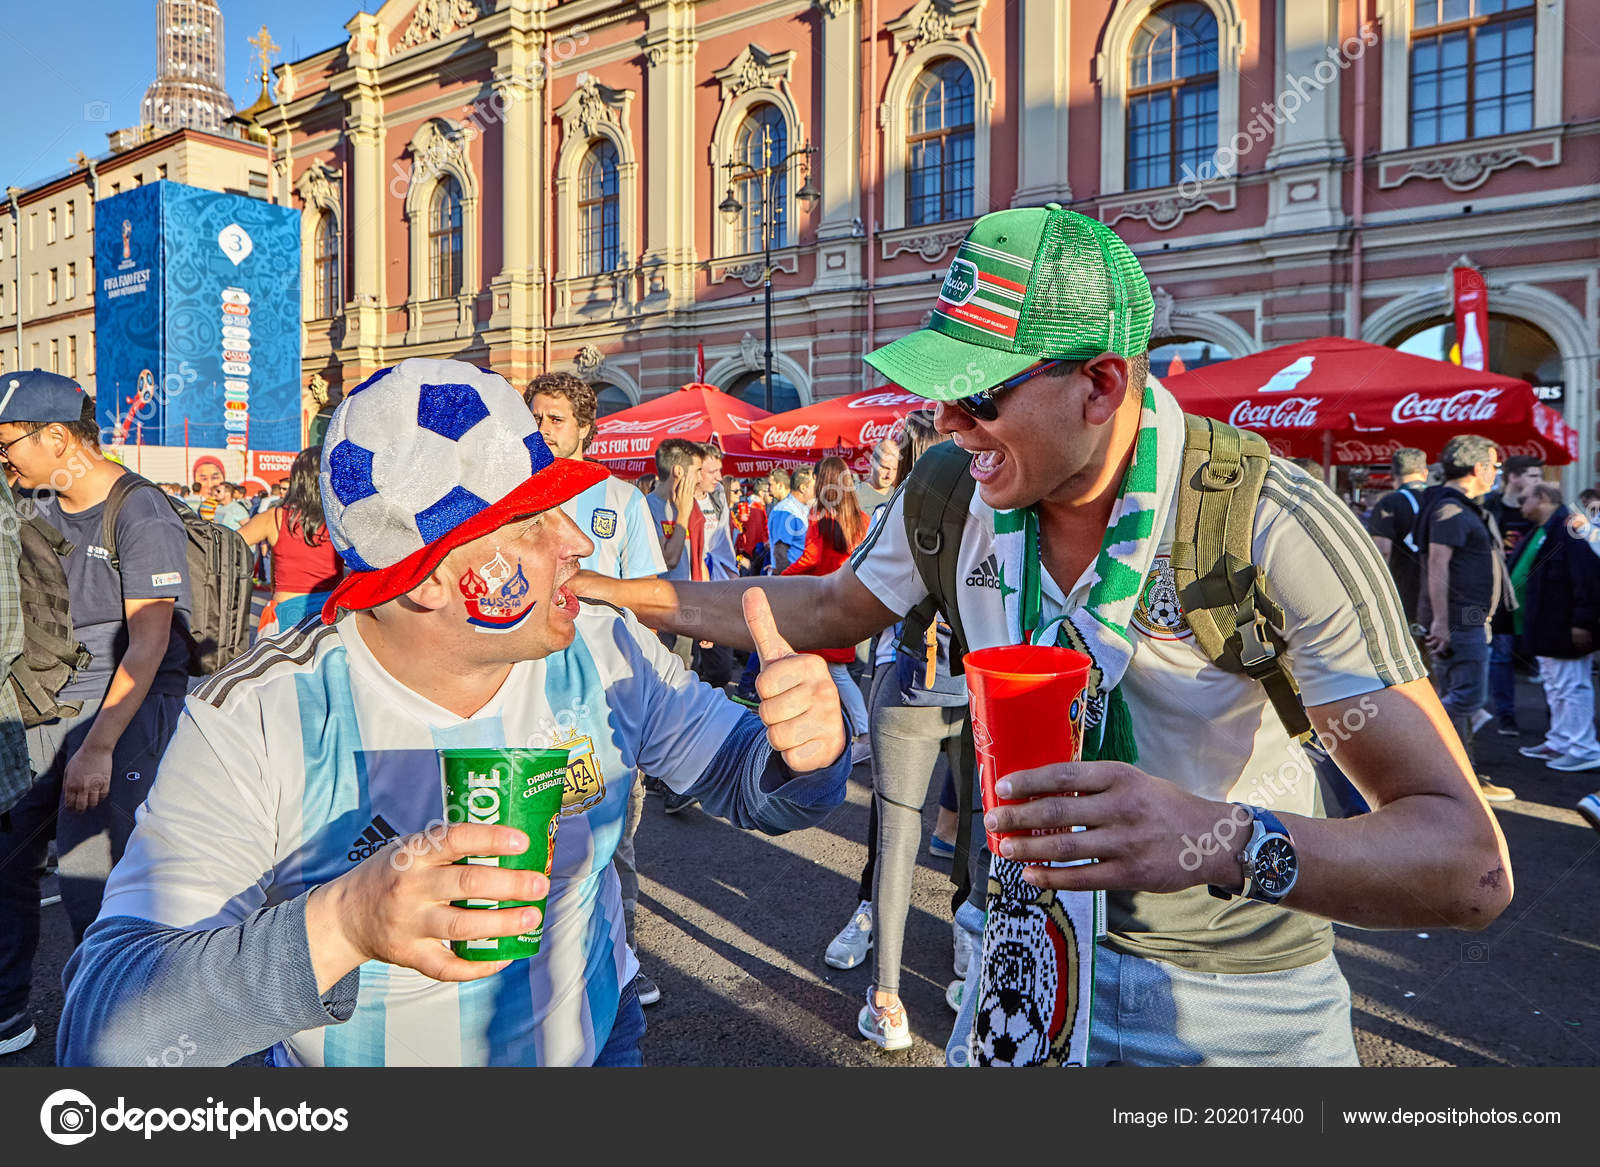 Petersburg russia june 2018 russian mexican soccer fans greet each petersburg russia june 2018 russian mexican soccer fans greet each stock photo m4hsunfo